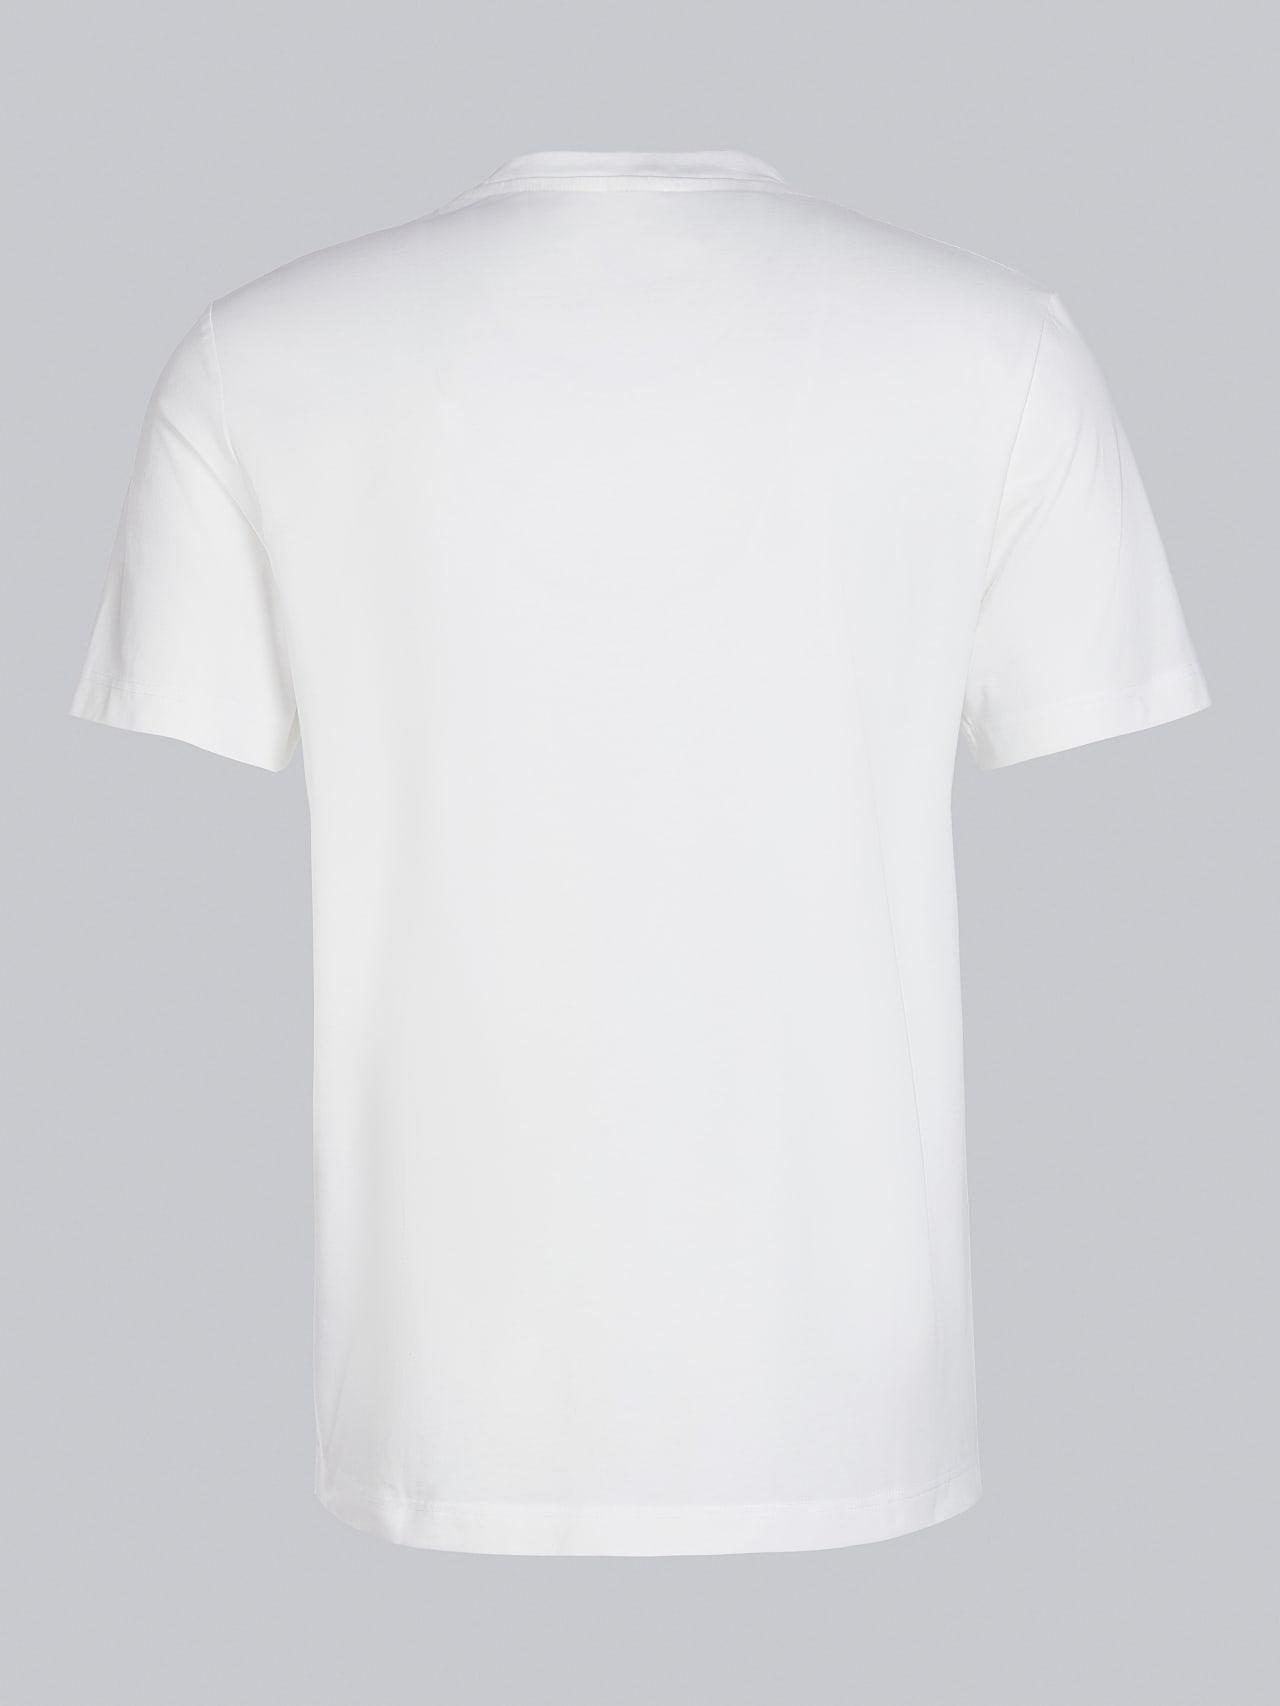 JABIS V1.Y5.02 Logo Print T-Shirt offwhite Left Alpha Tauri